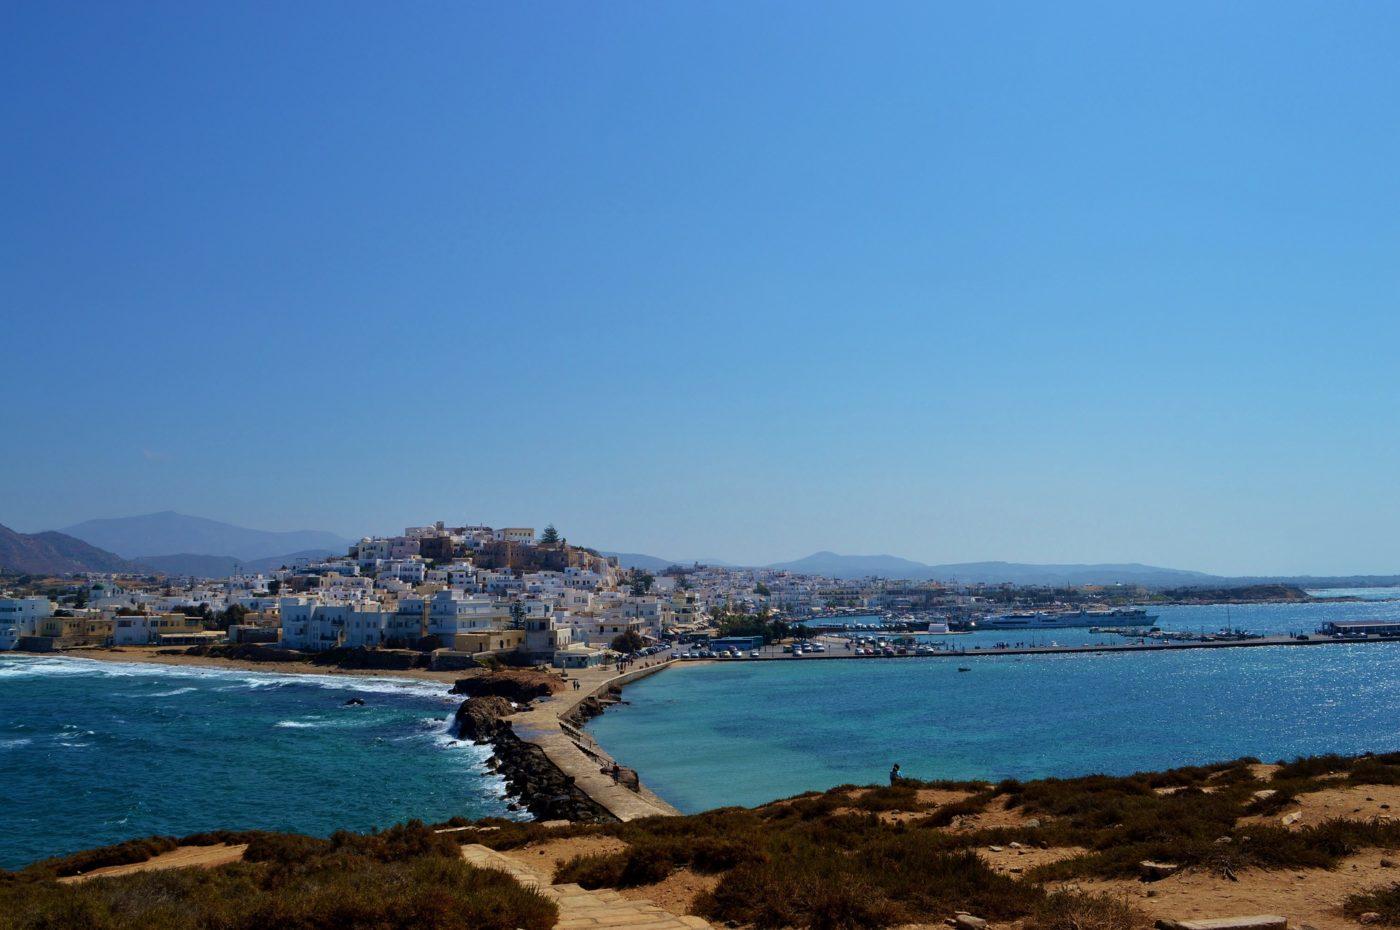 the Greek island of Naxos